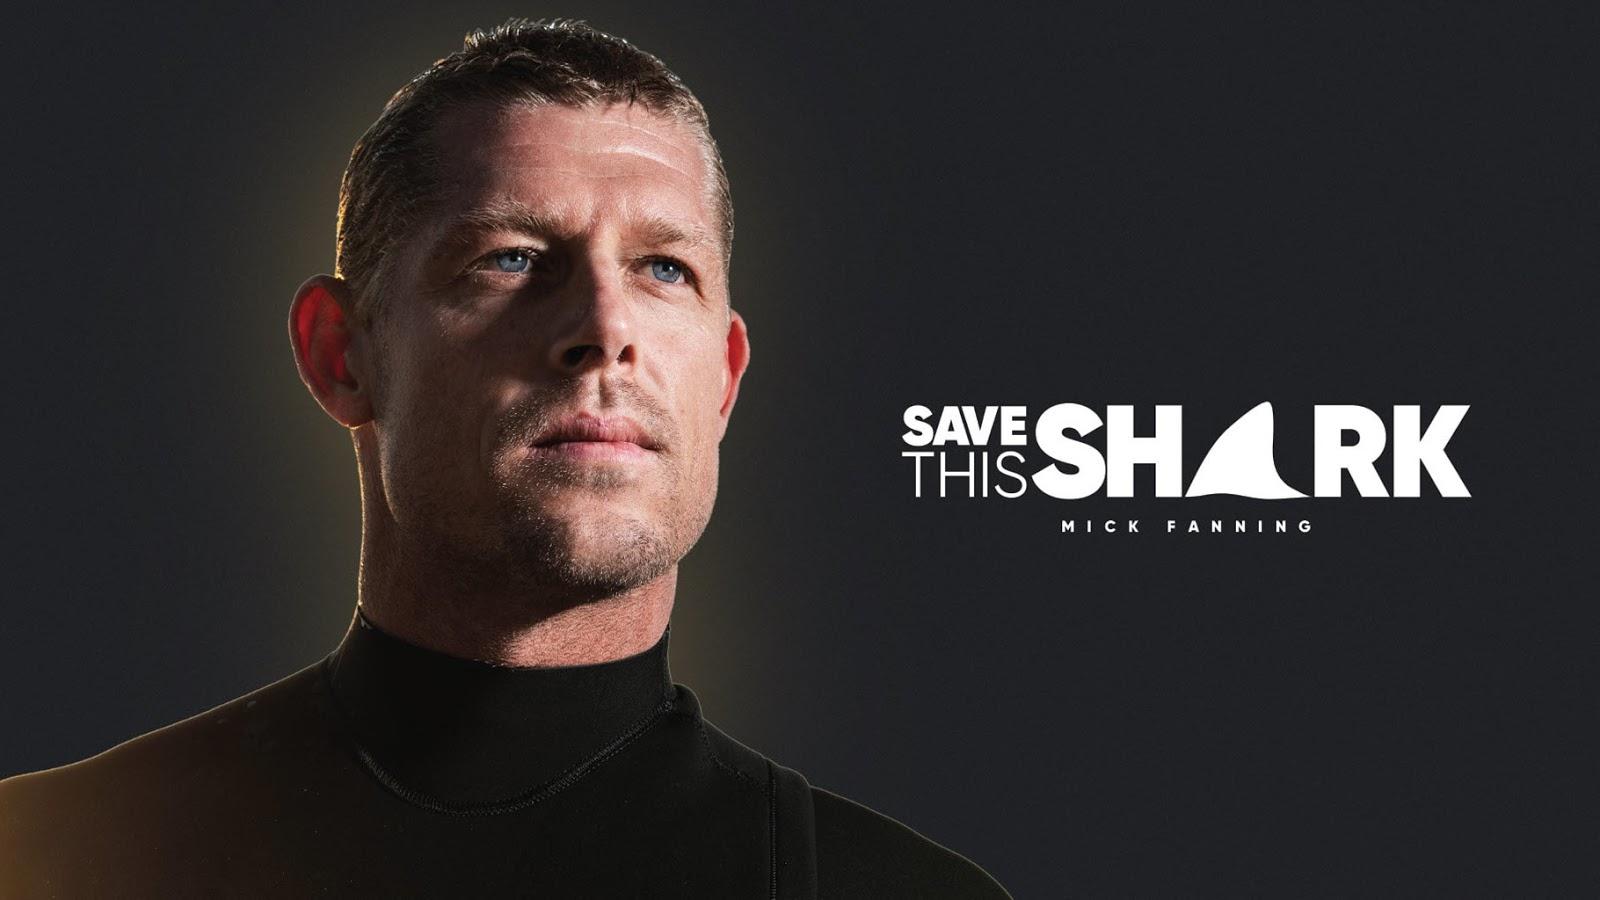 Save This Shark Trailer